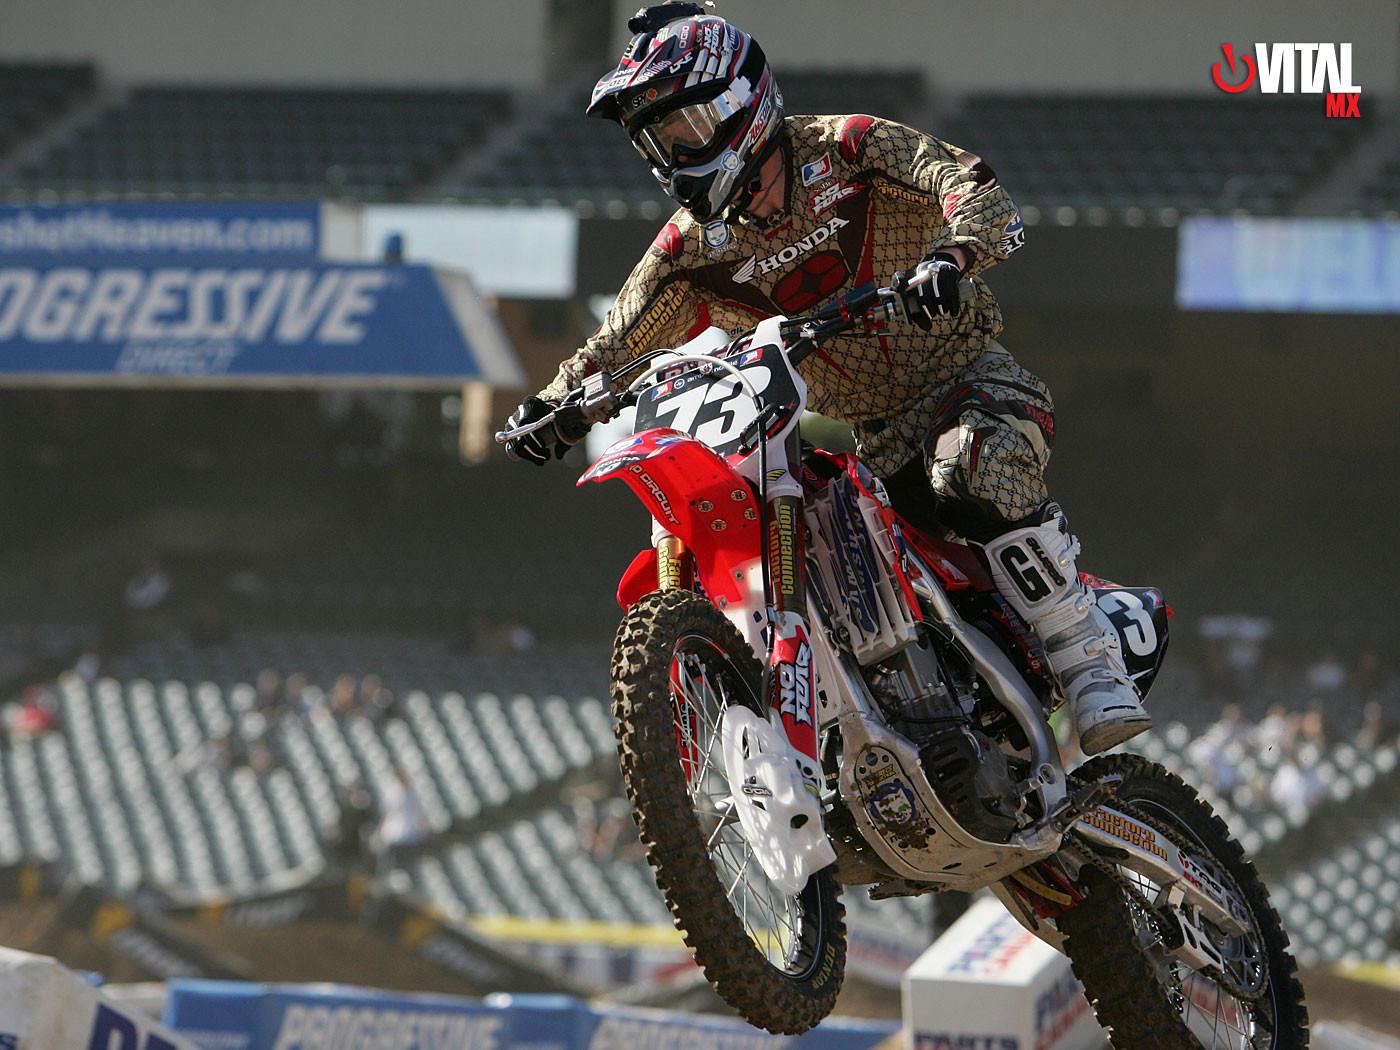 2007 Anaheim 3 Supercross